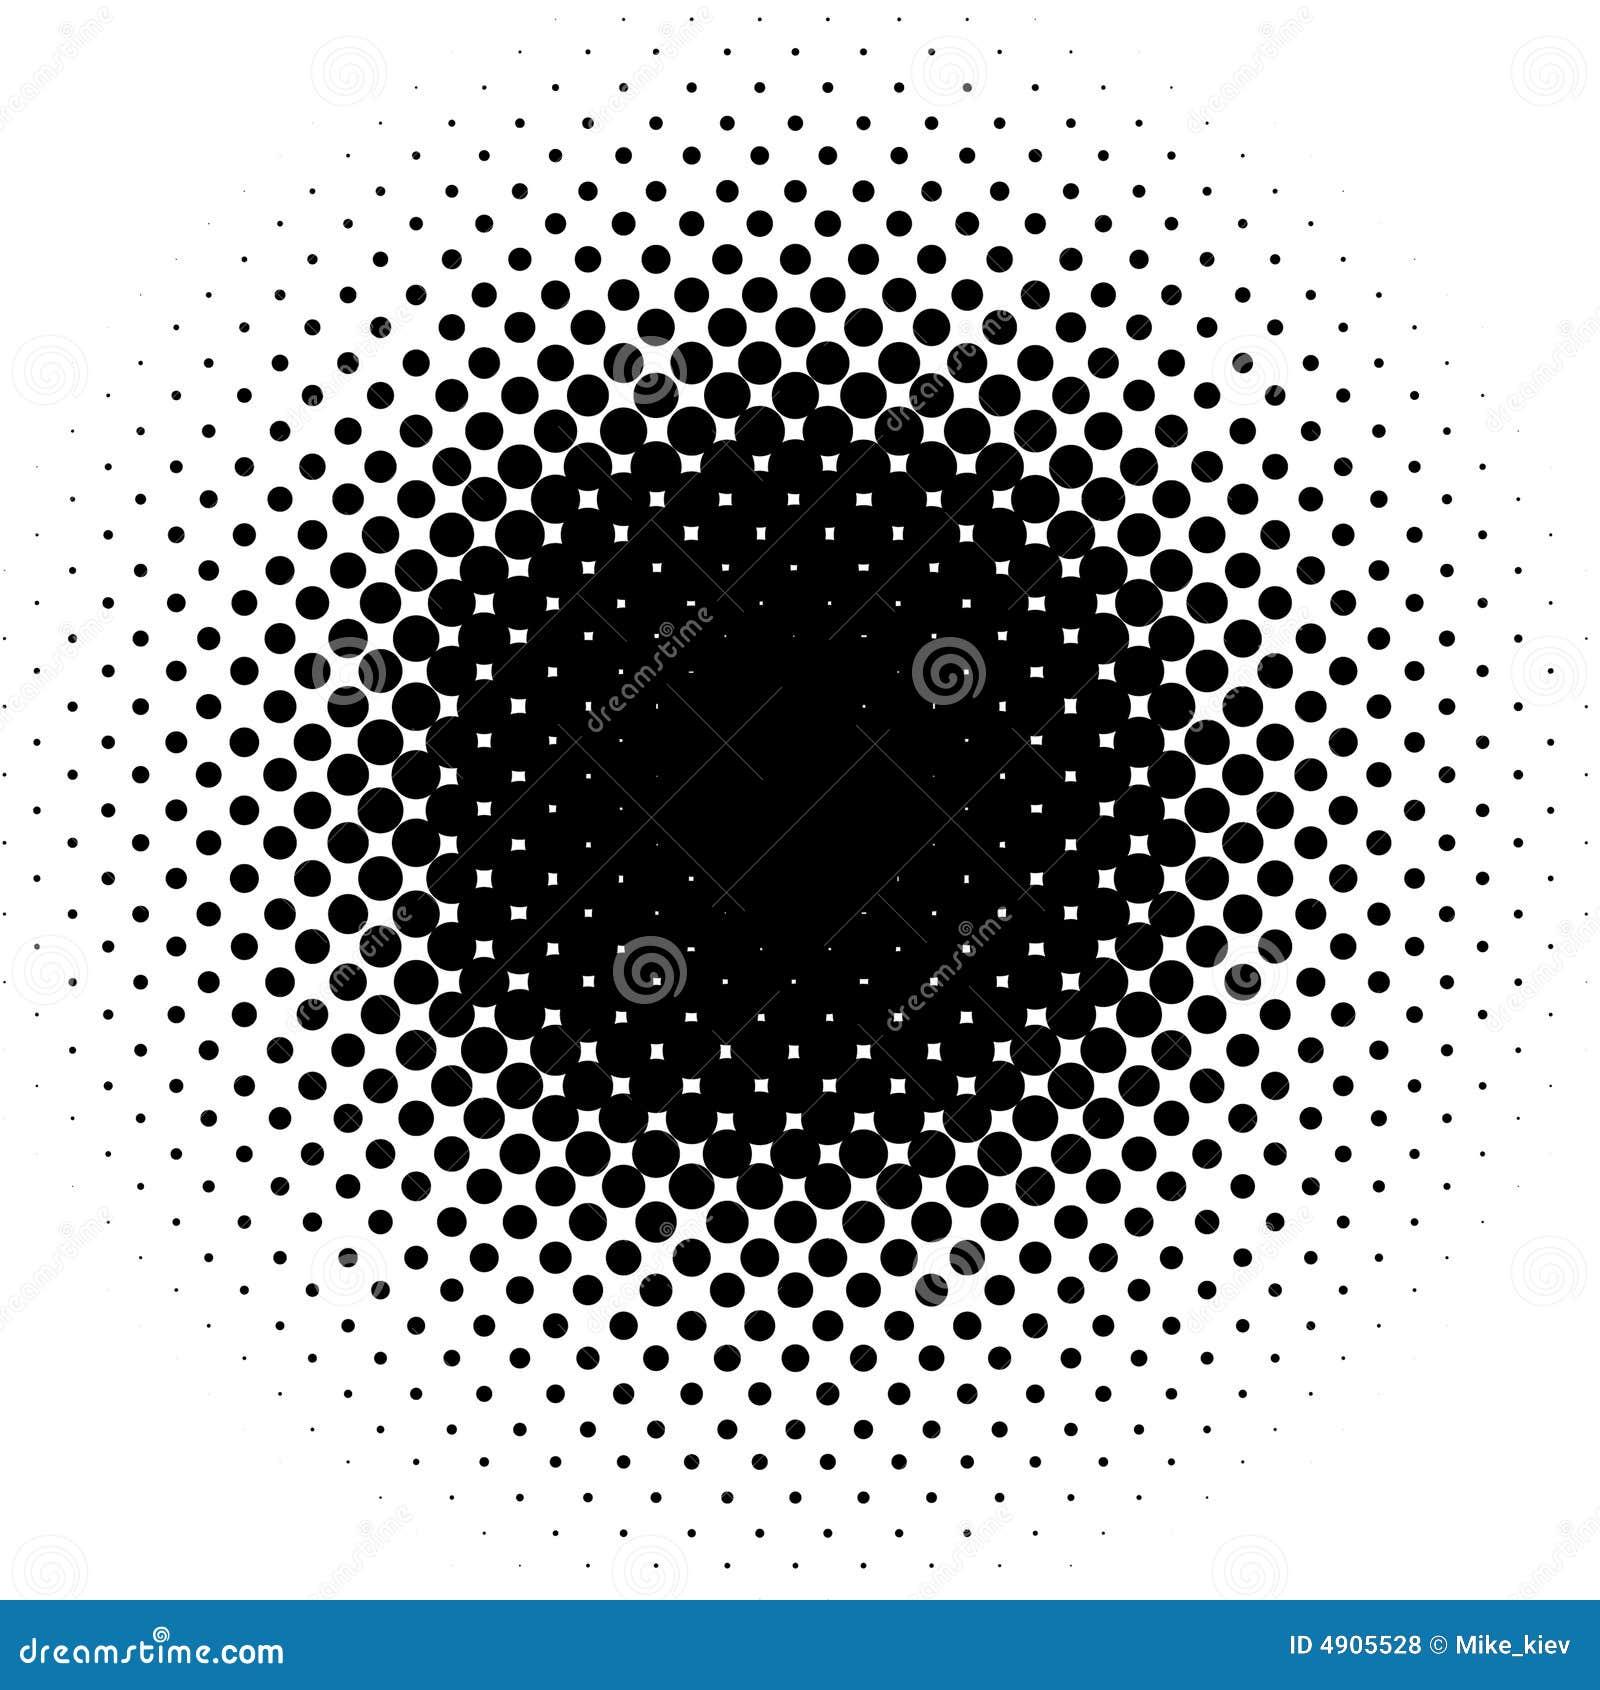 vector dots pattern stock illustration  image of pattern